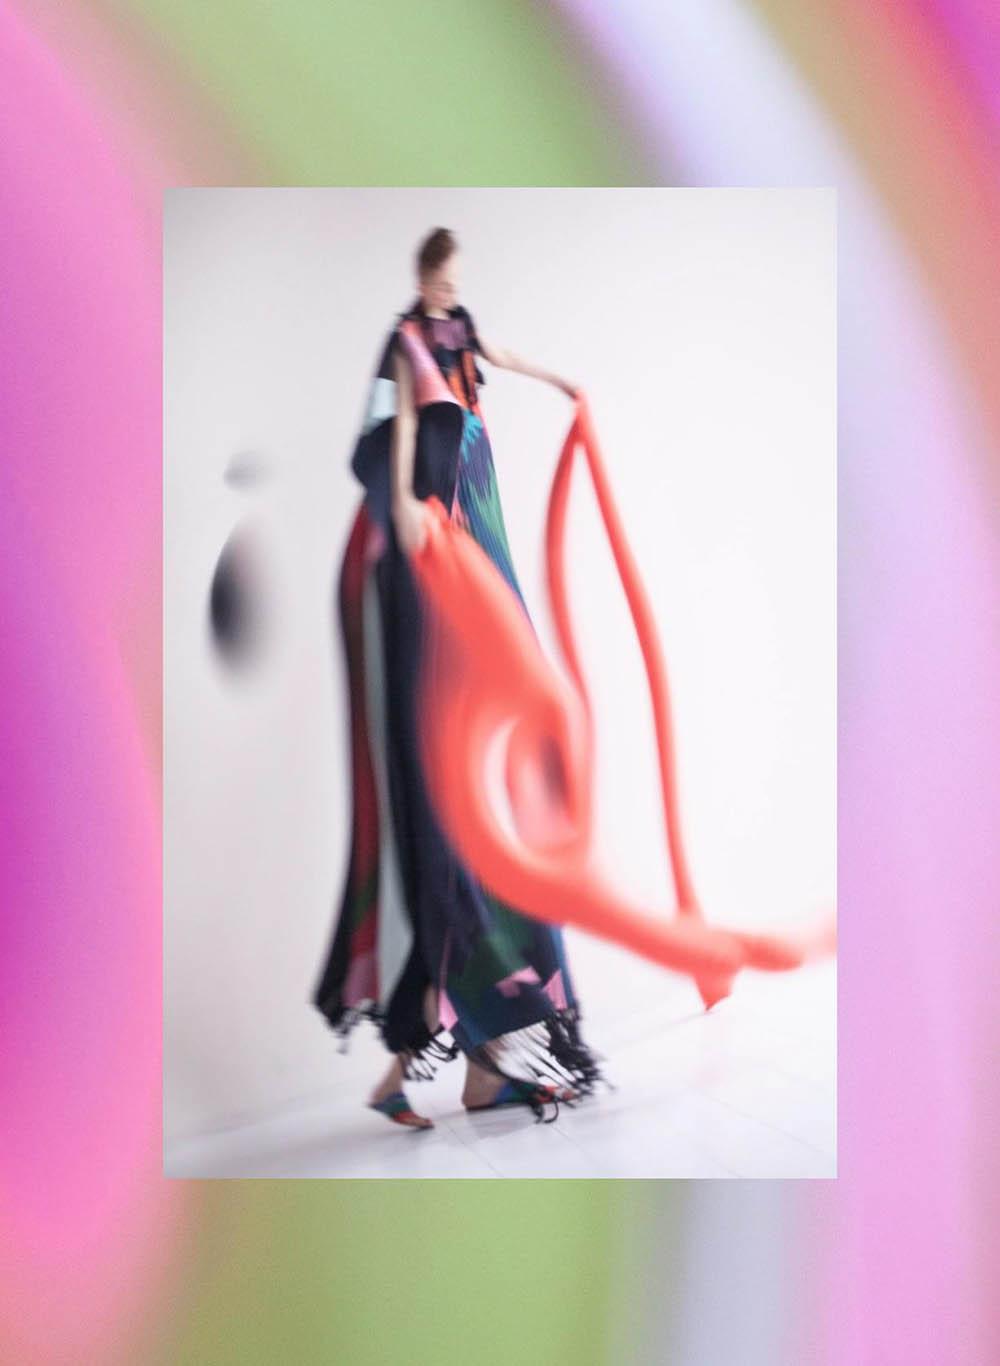 Lina Hoss by Paul Rousteau for Harper's Bazaar Germany April 2018